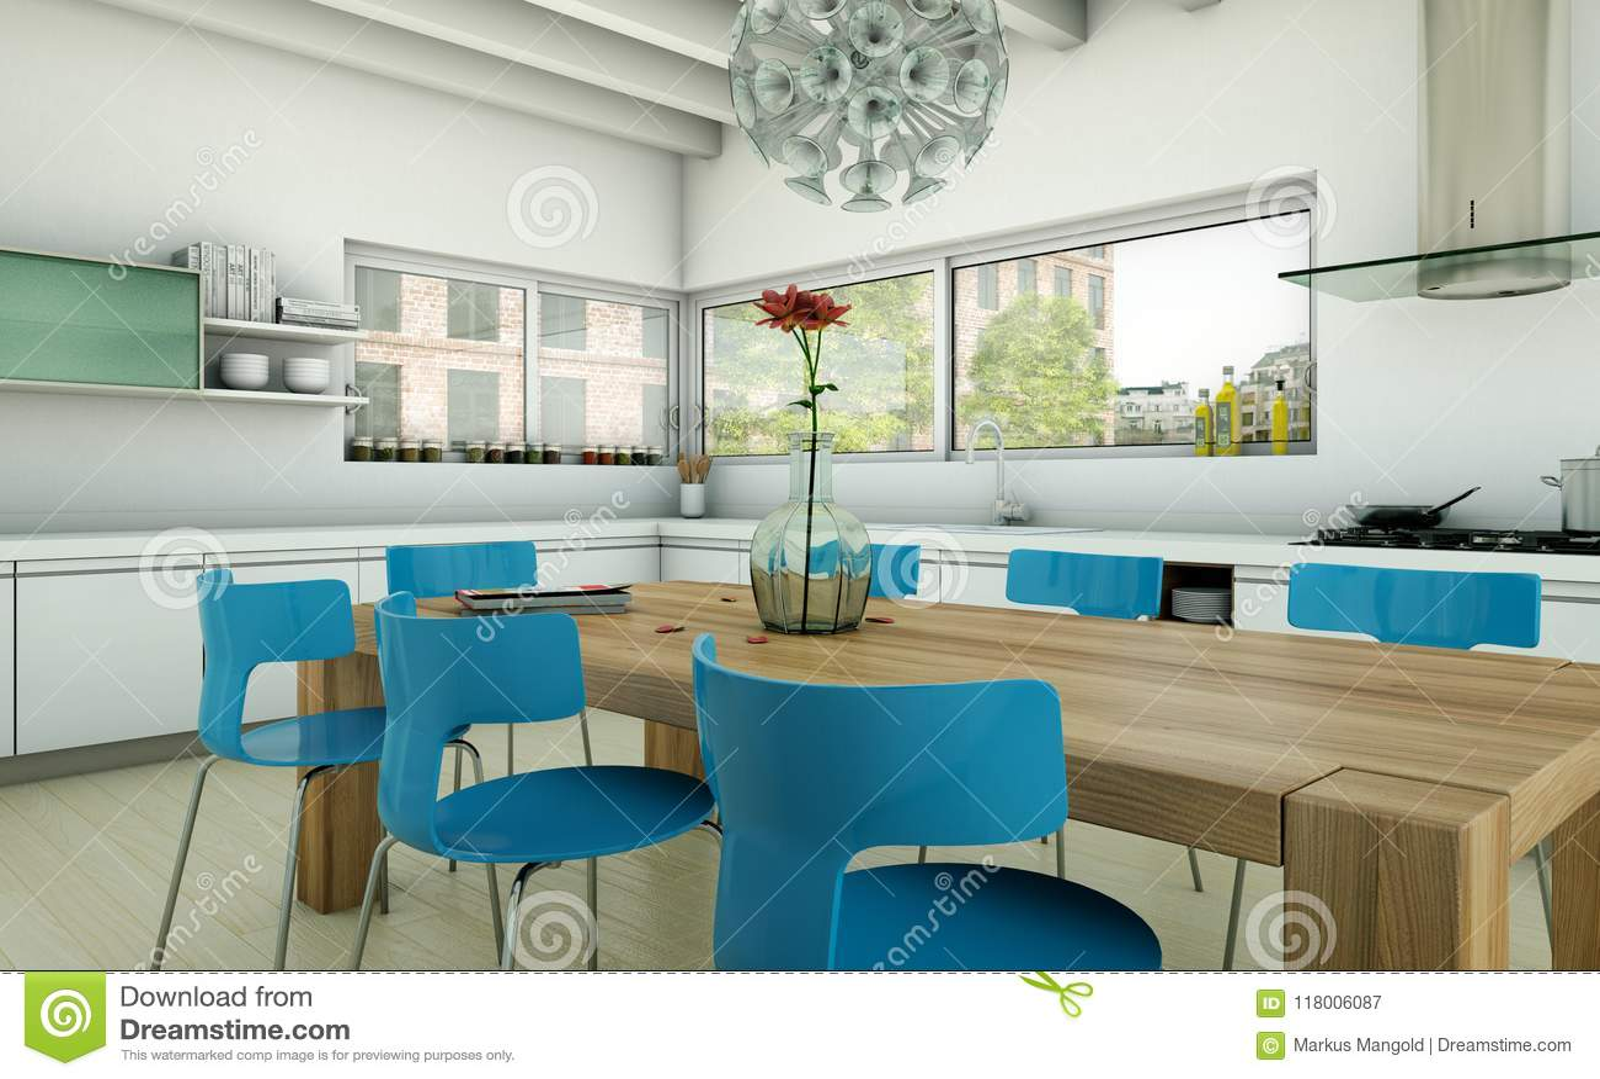 Modern Kitchen Design Blue And White